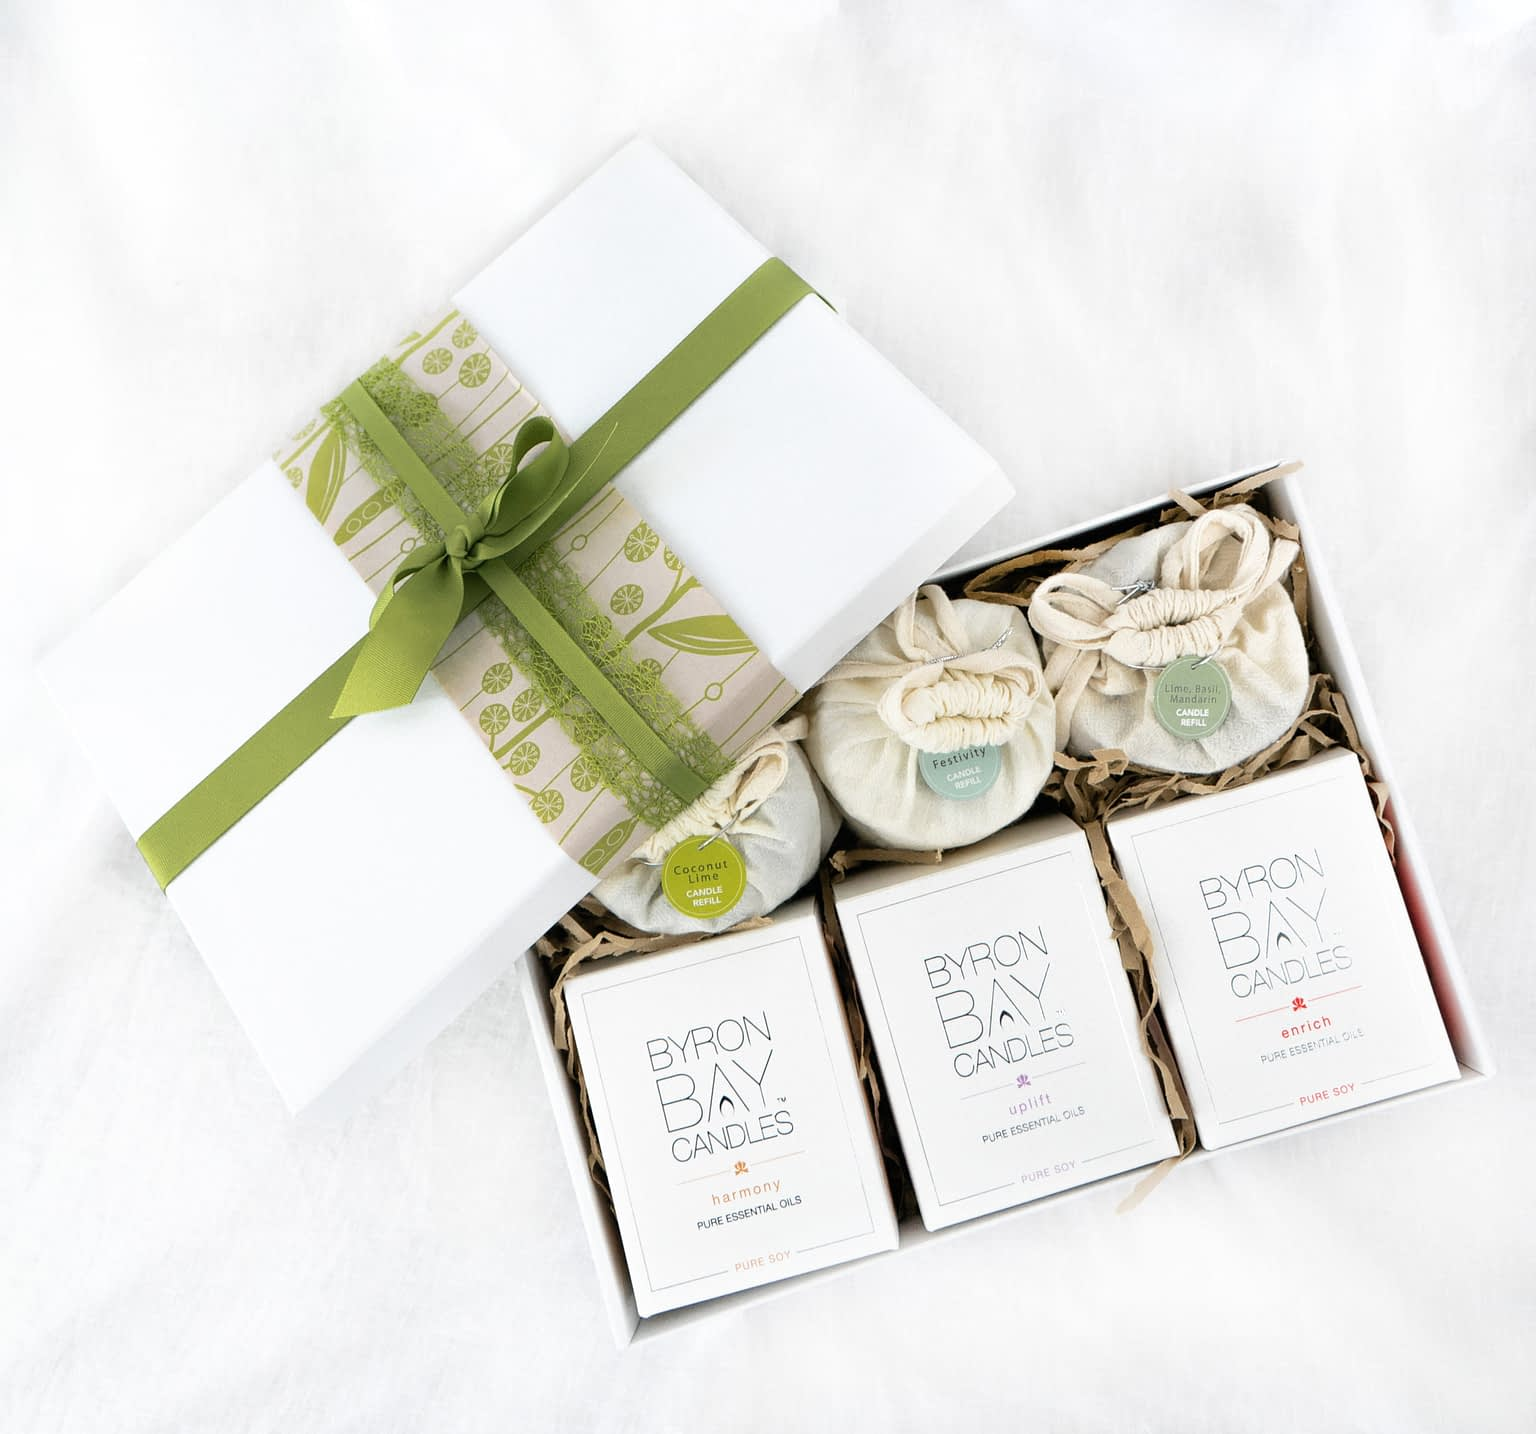 Candle_gift_box_set_Byron_Bay_Candles